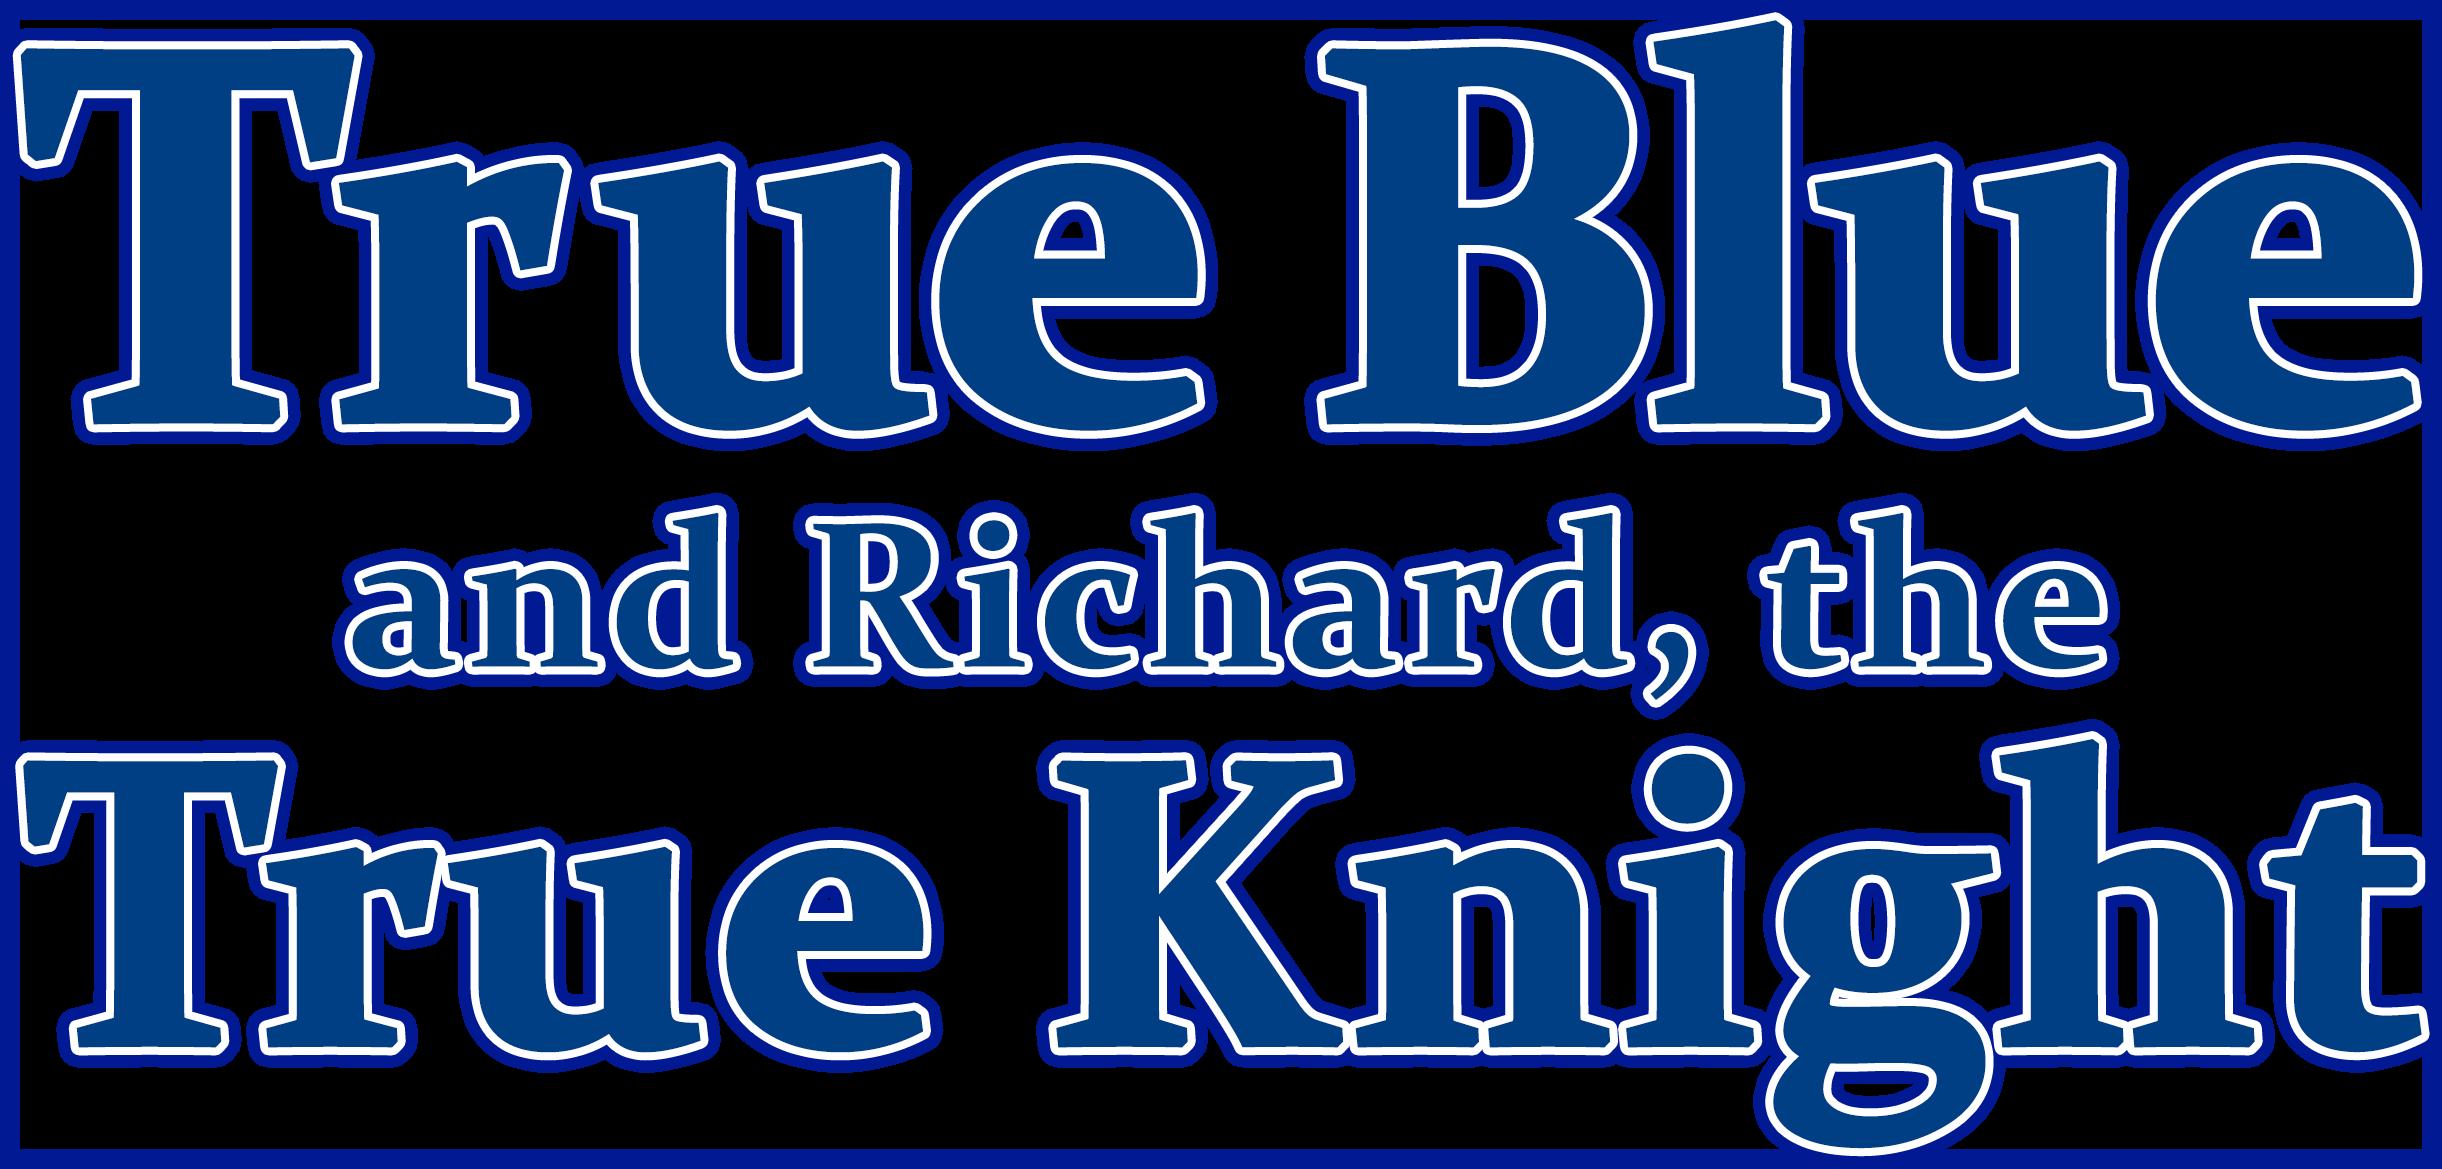 TRUE BLUE & RICHARD, THE TRUE KNIGHT